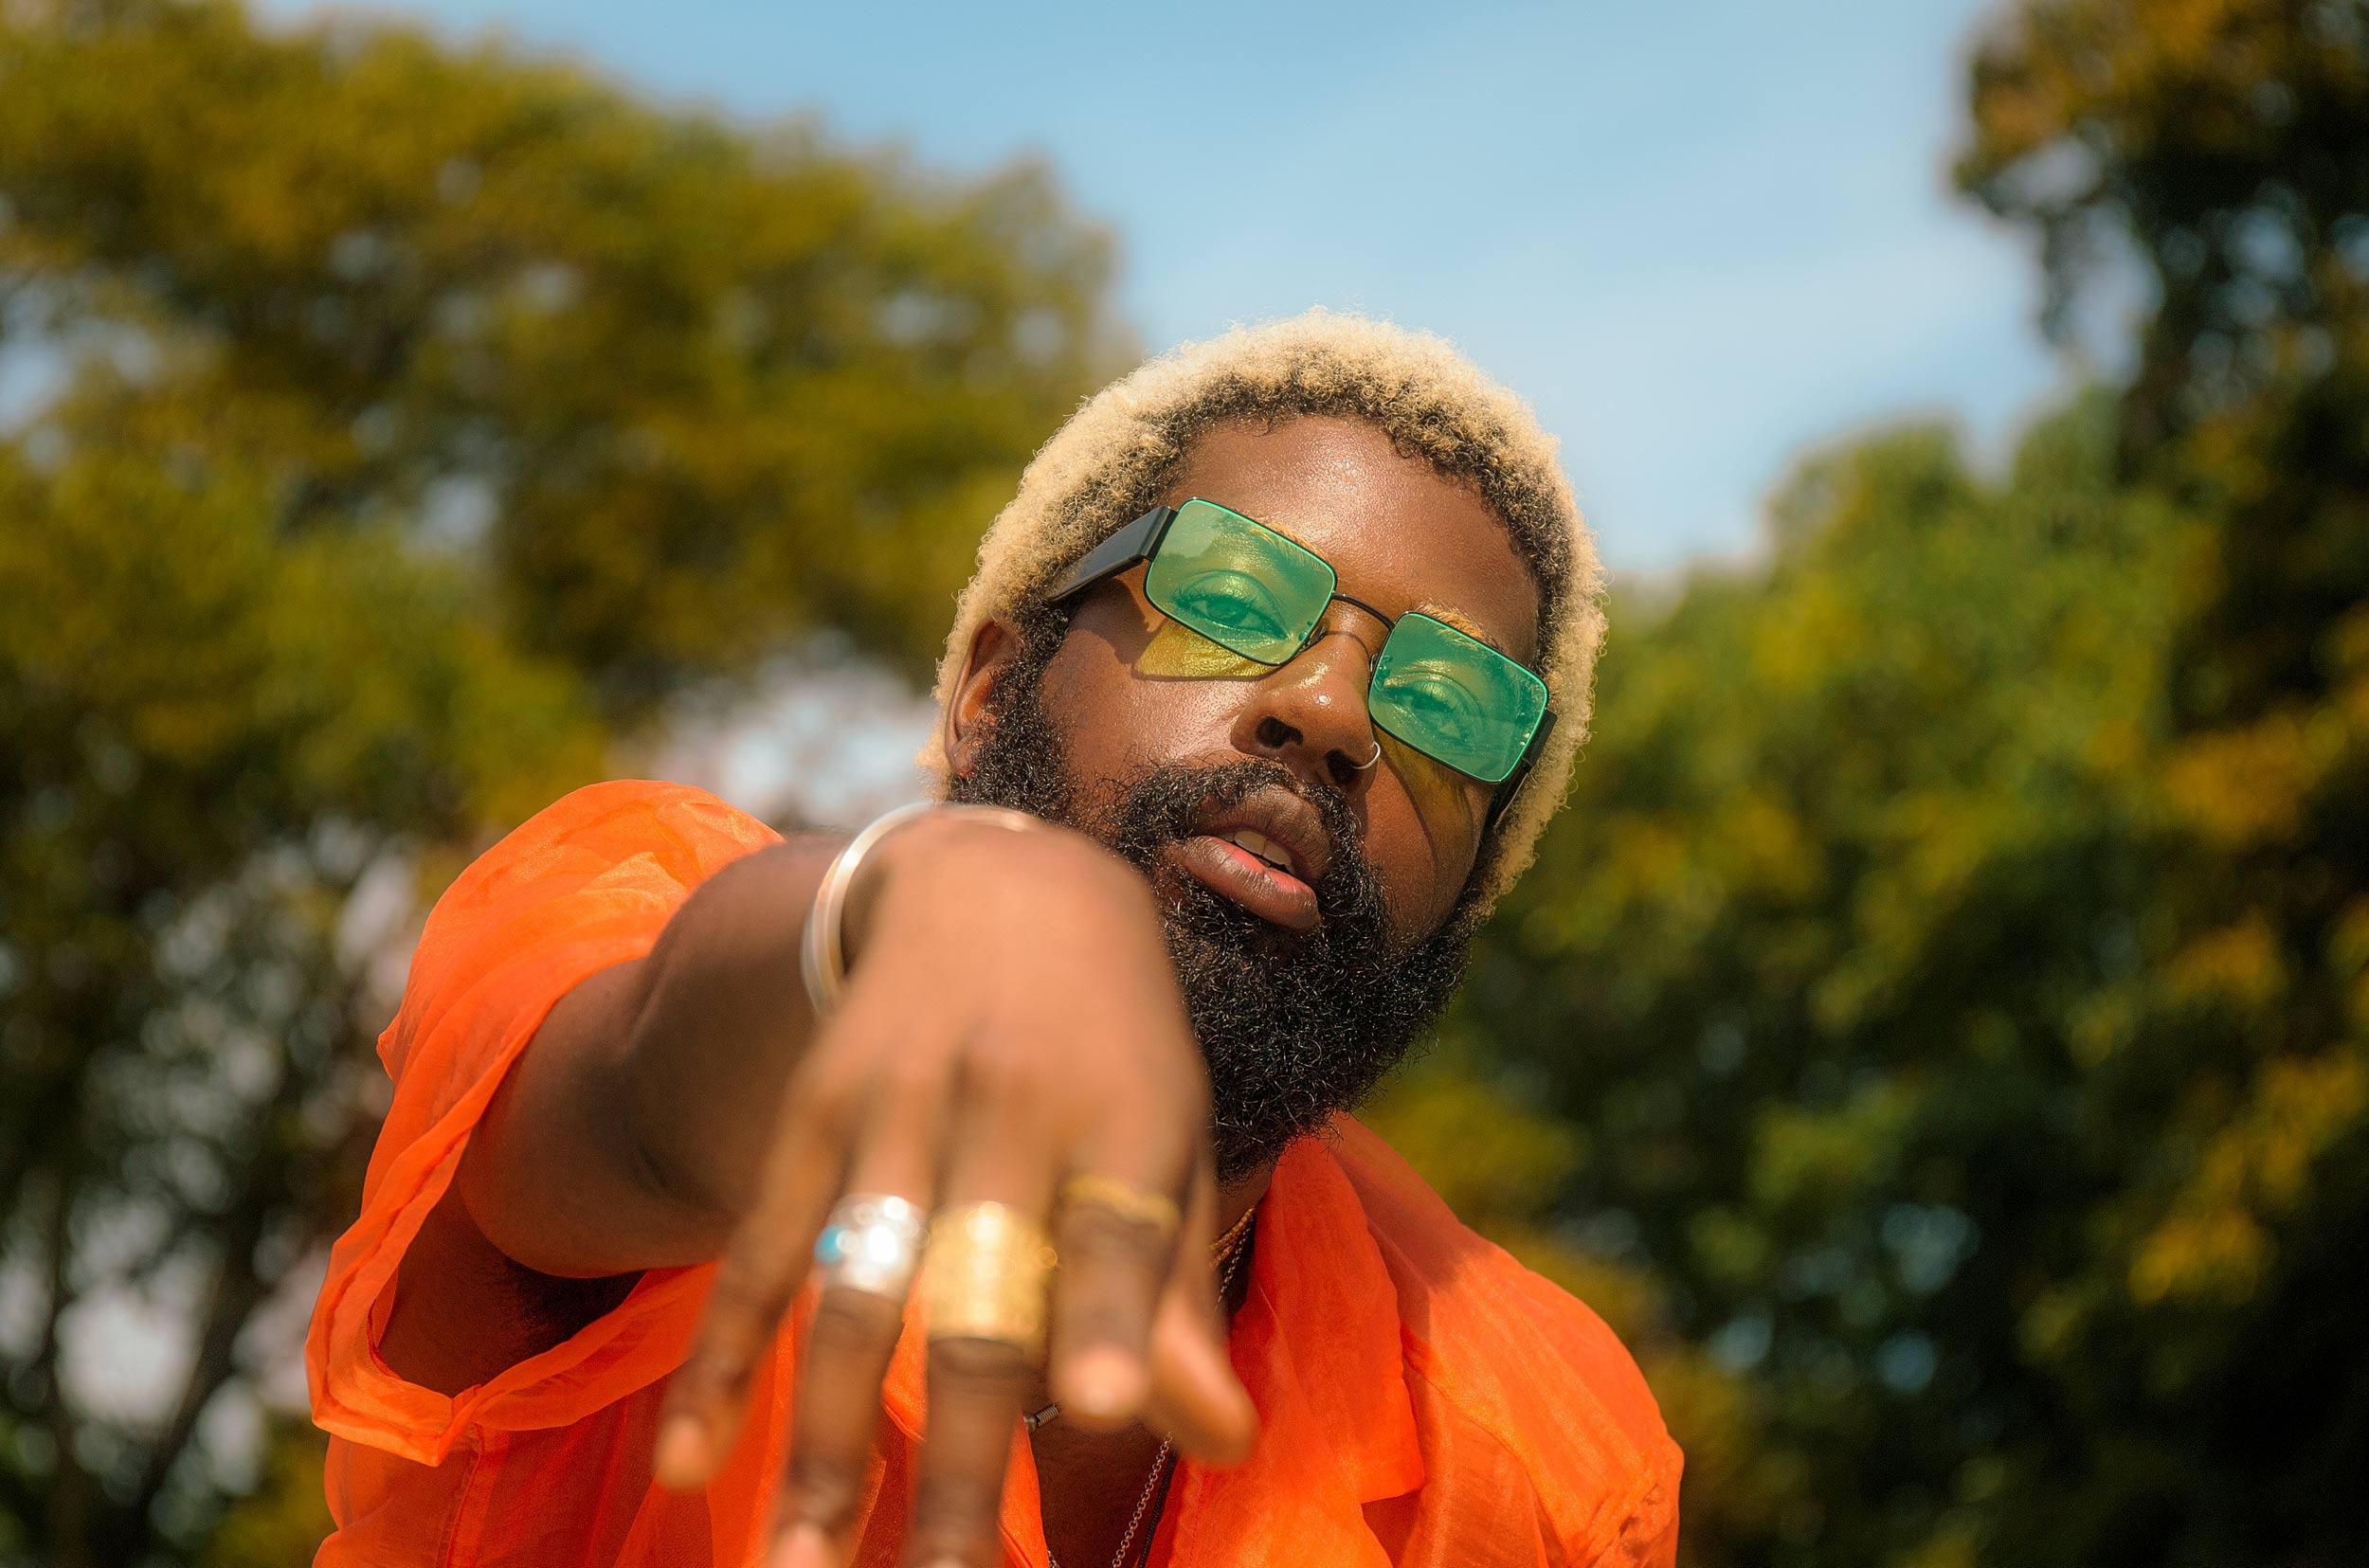 DJ Freedem, the 'trap gardener' advocating for reparations through houseplants